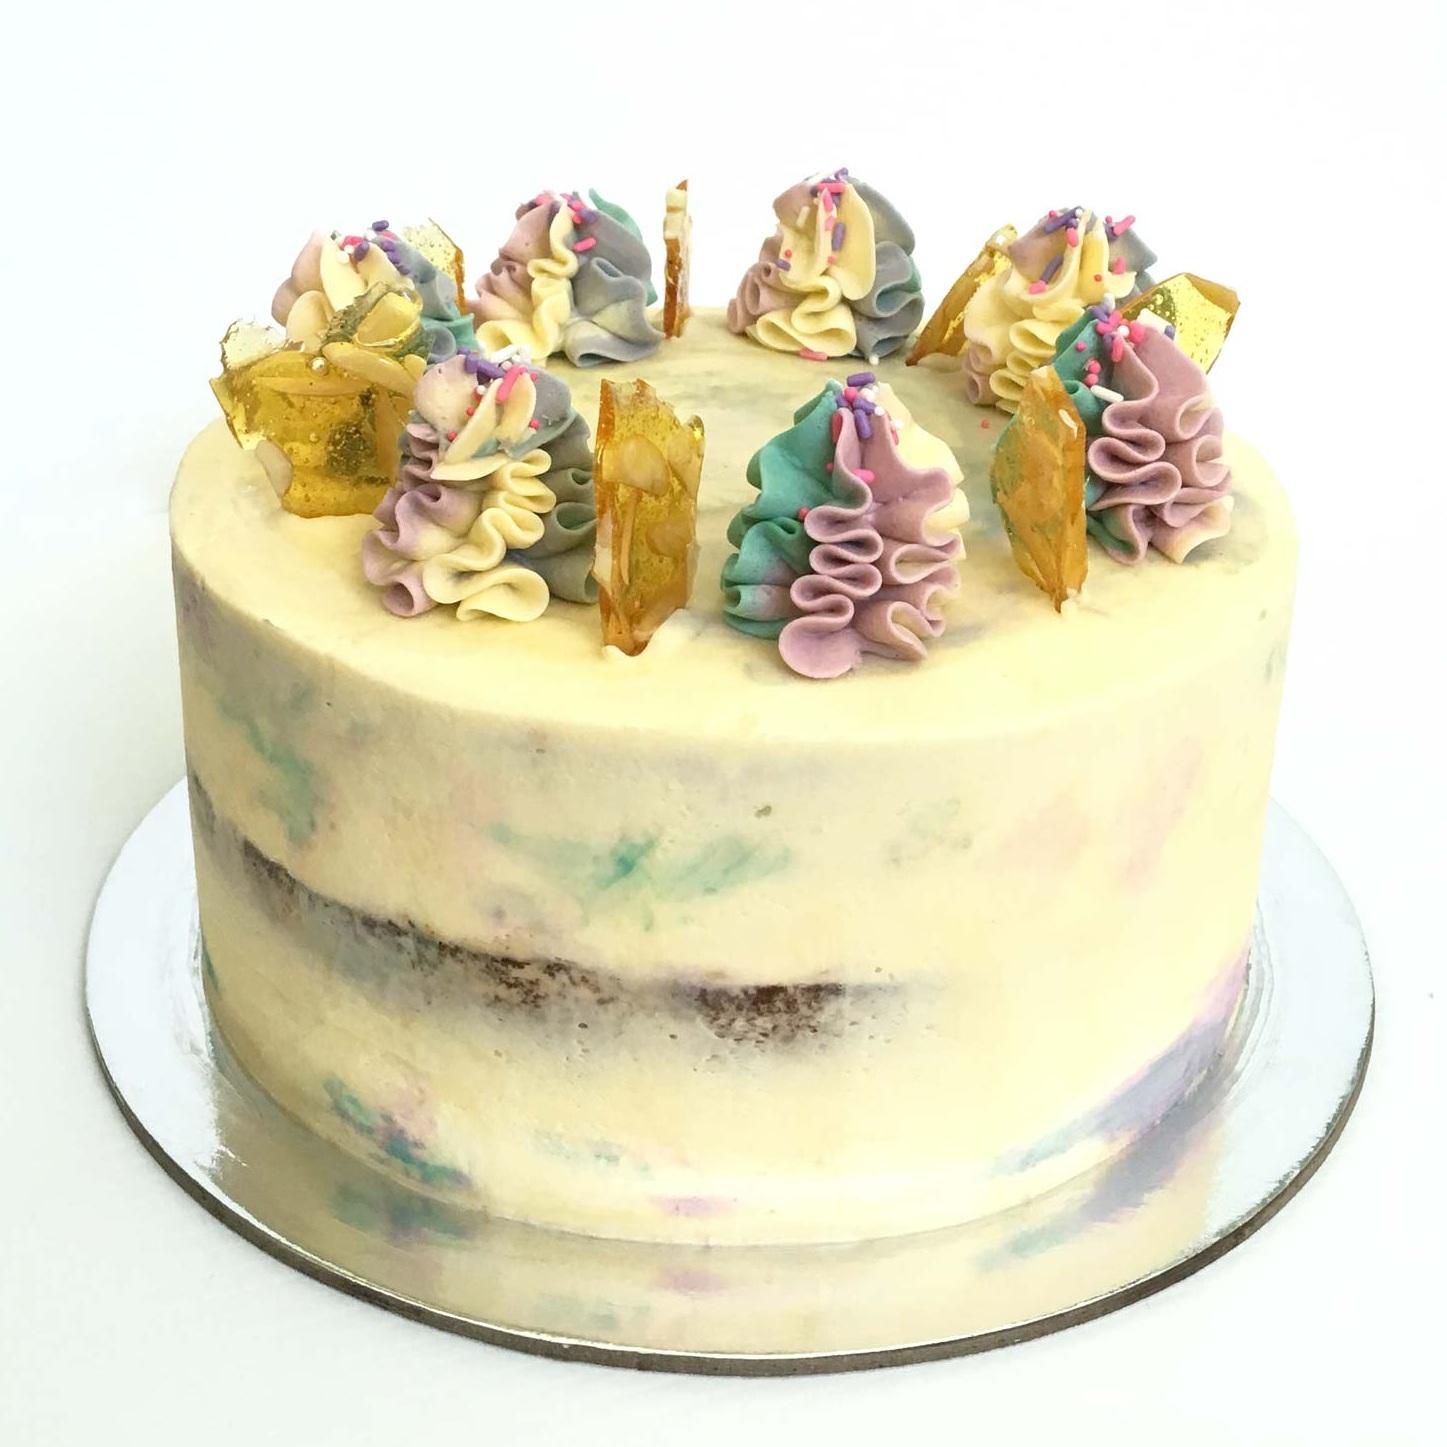 The_Little_Cake_Maker_Perth_Baker_CustomCakes_DayCakes_Slices_Tarts_Cupcakes_Day_Cakes_2.jpg